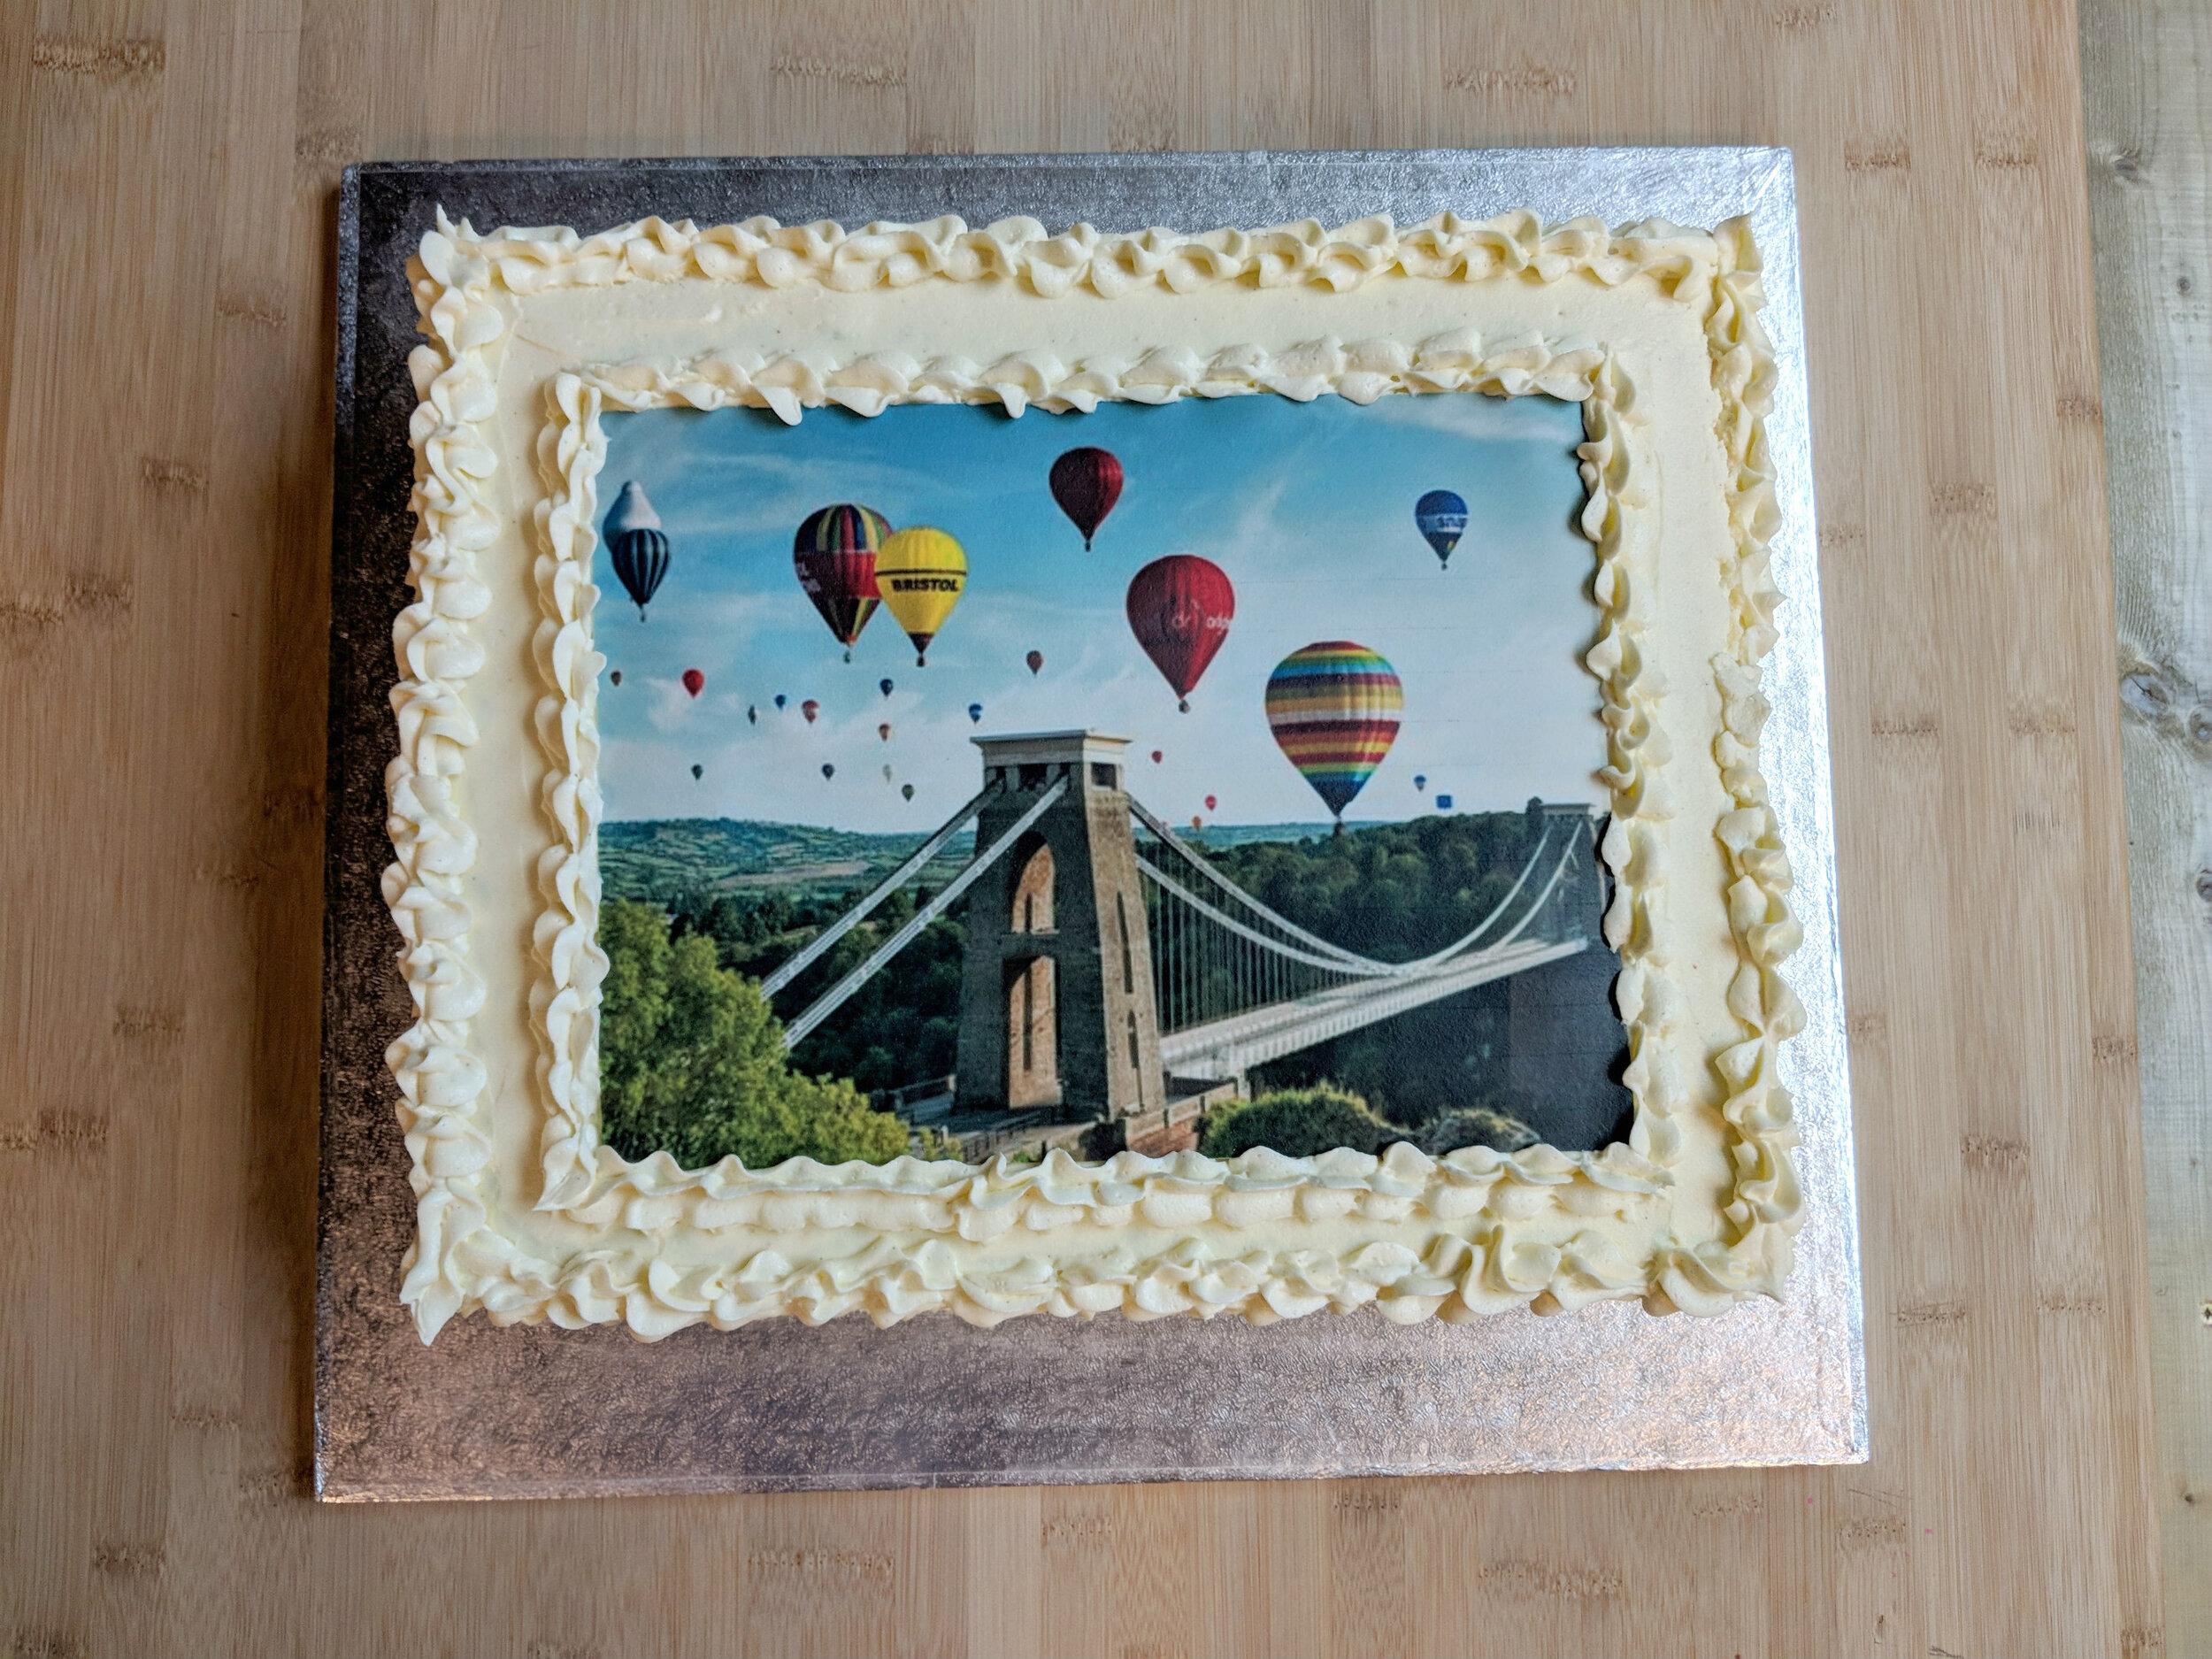 Deocraft cakes.jpg